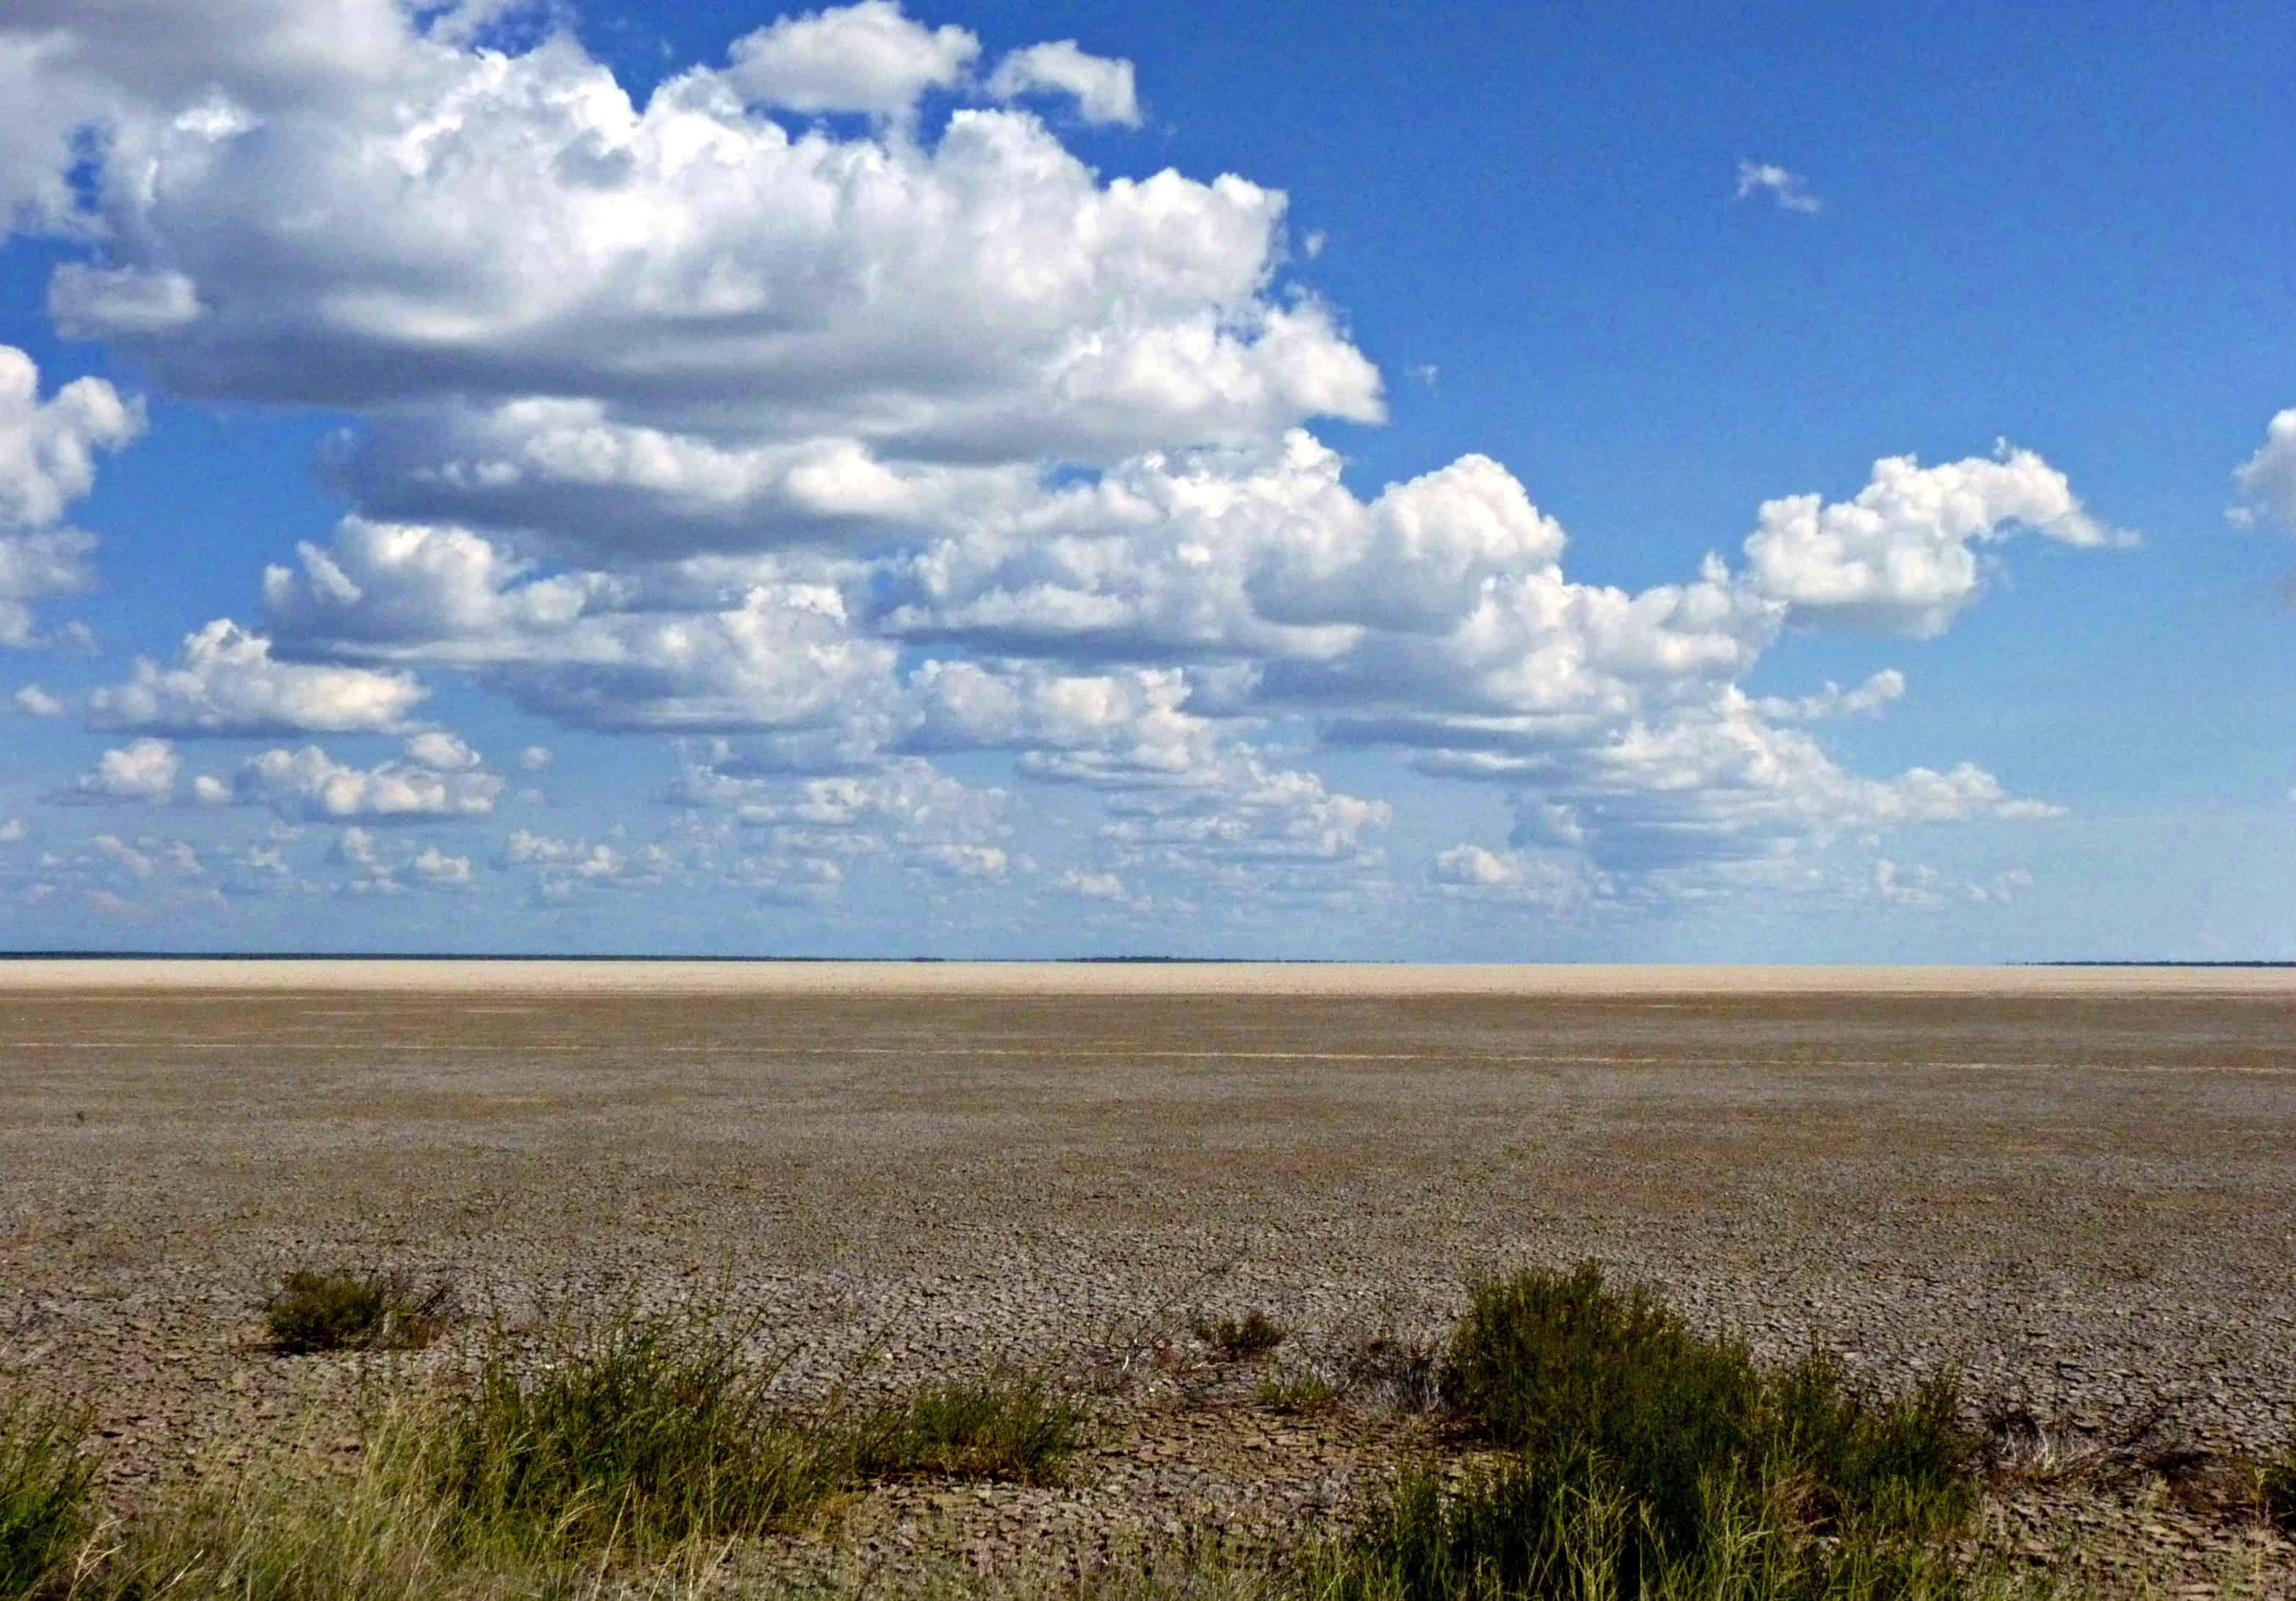 Etosha National Park - The Pan